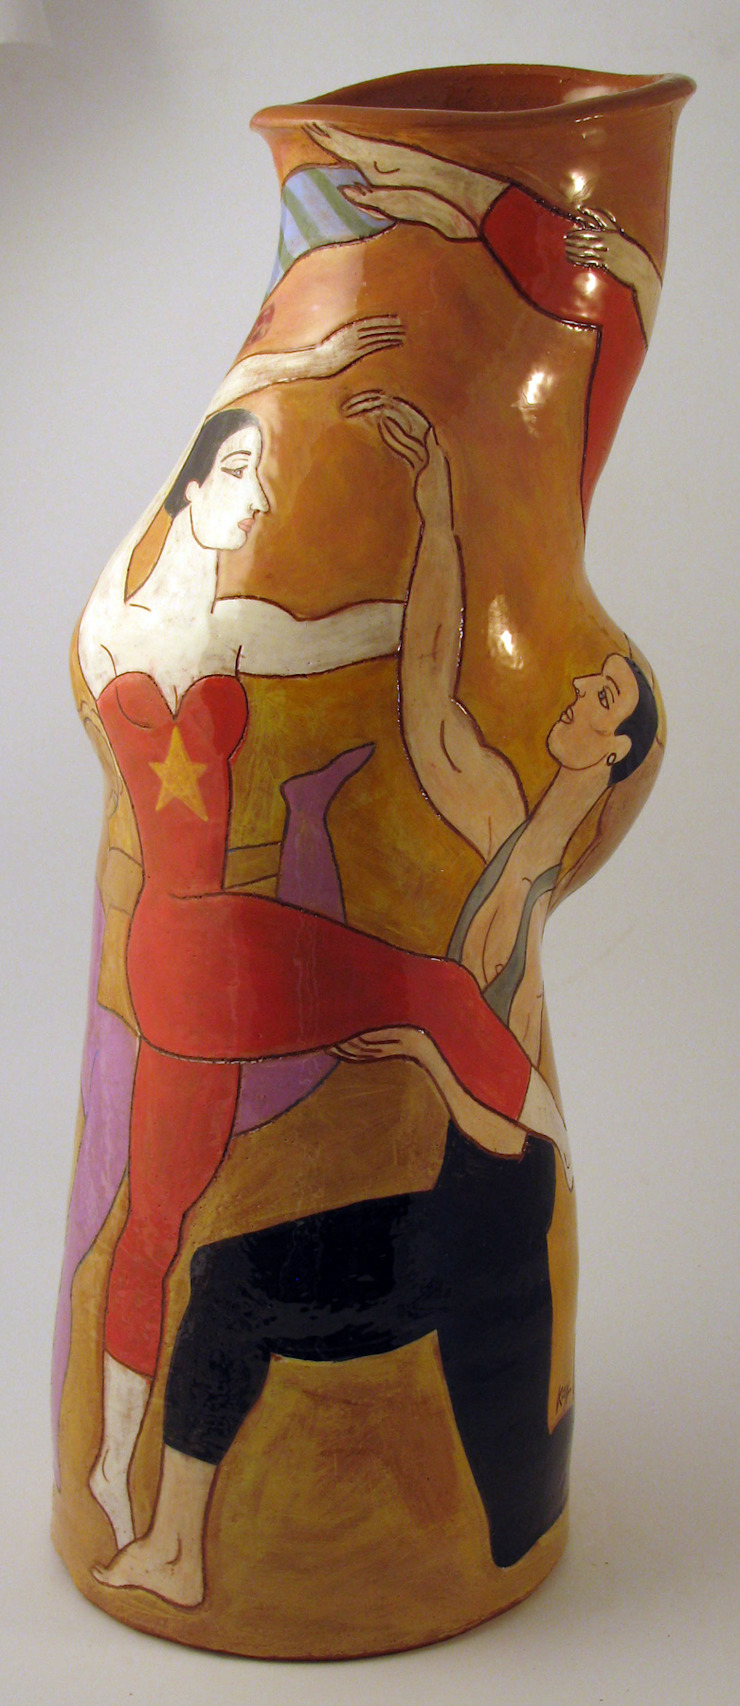 Acrobats: modern  by Michael Kay; Ceramic Artist, Modern